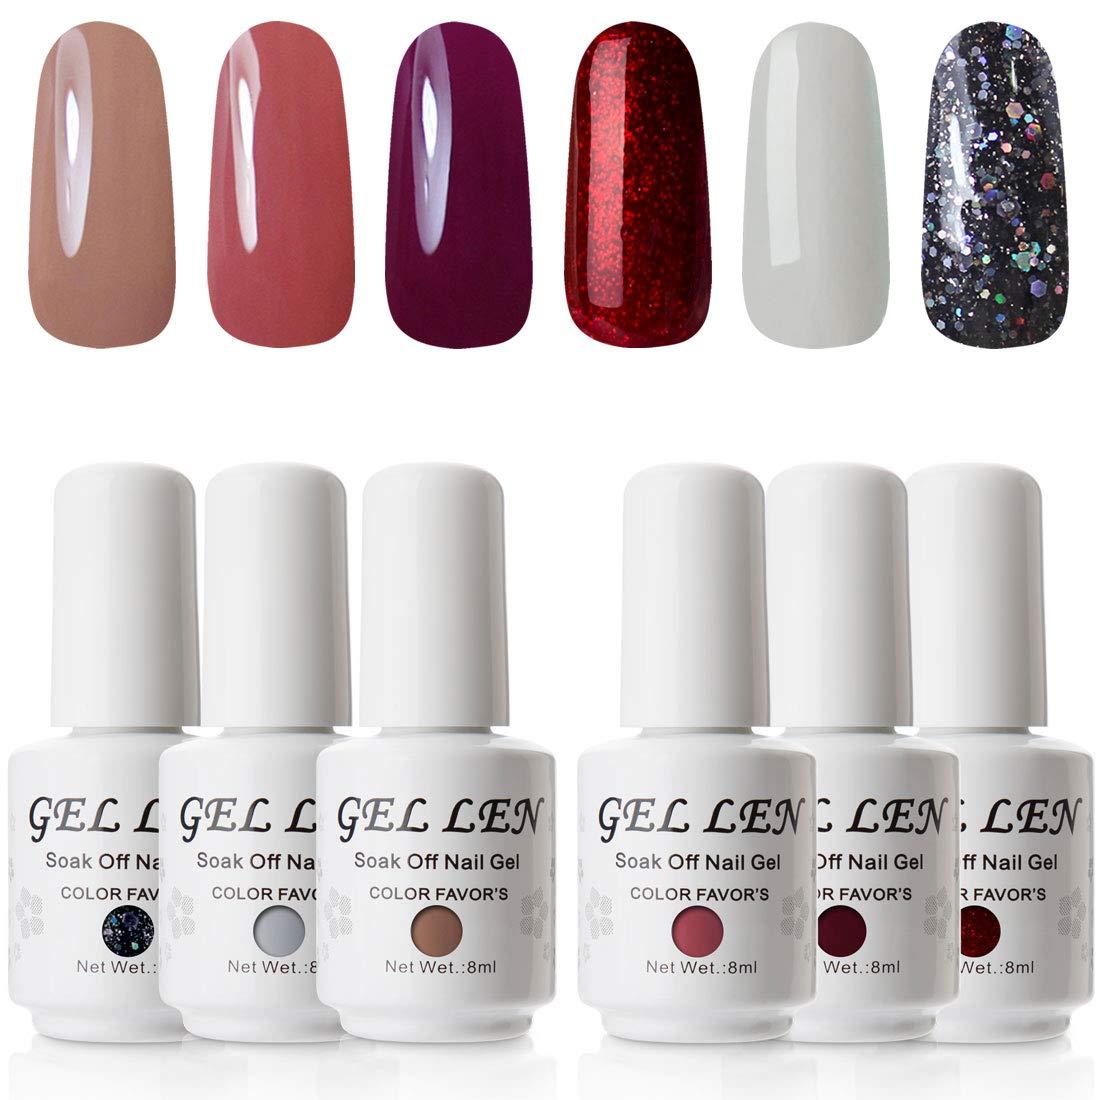 e8095d01b8 Amazon.com : Gellen UV LED Gel Nail Polish Set Muddy Earthy Colors Nude  Shade Kit 6 Colors 8ml Each : Beauty